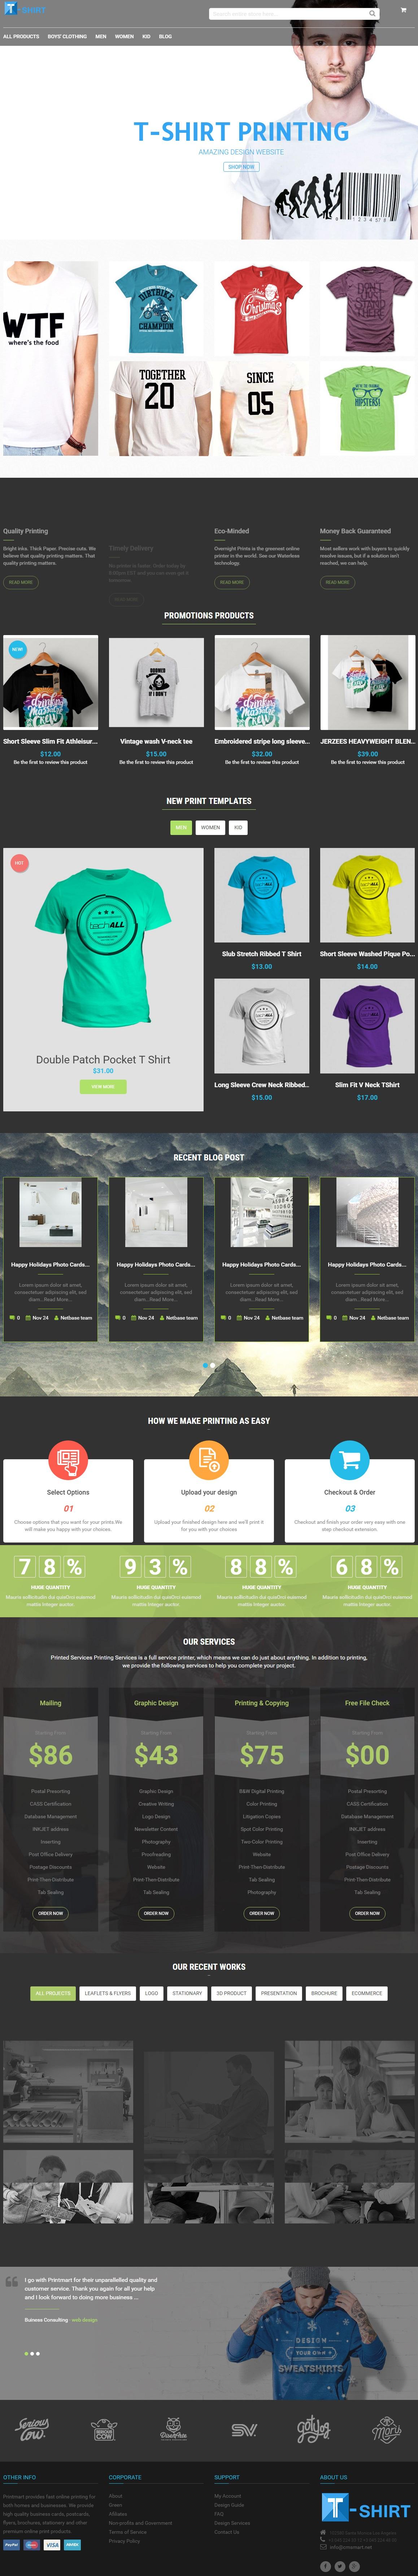 Magento Responsive Tshirt Printing Website Theme Sharing - T shirt printing website template